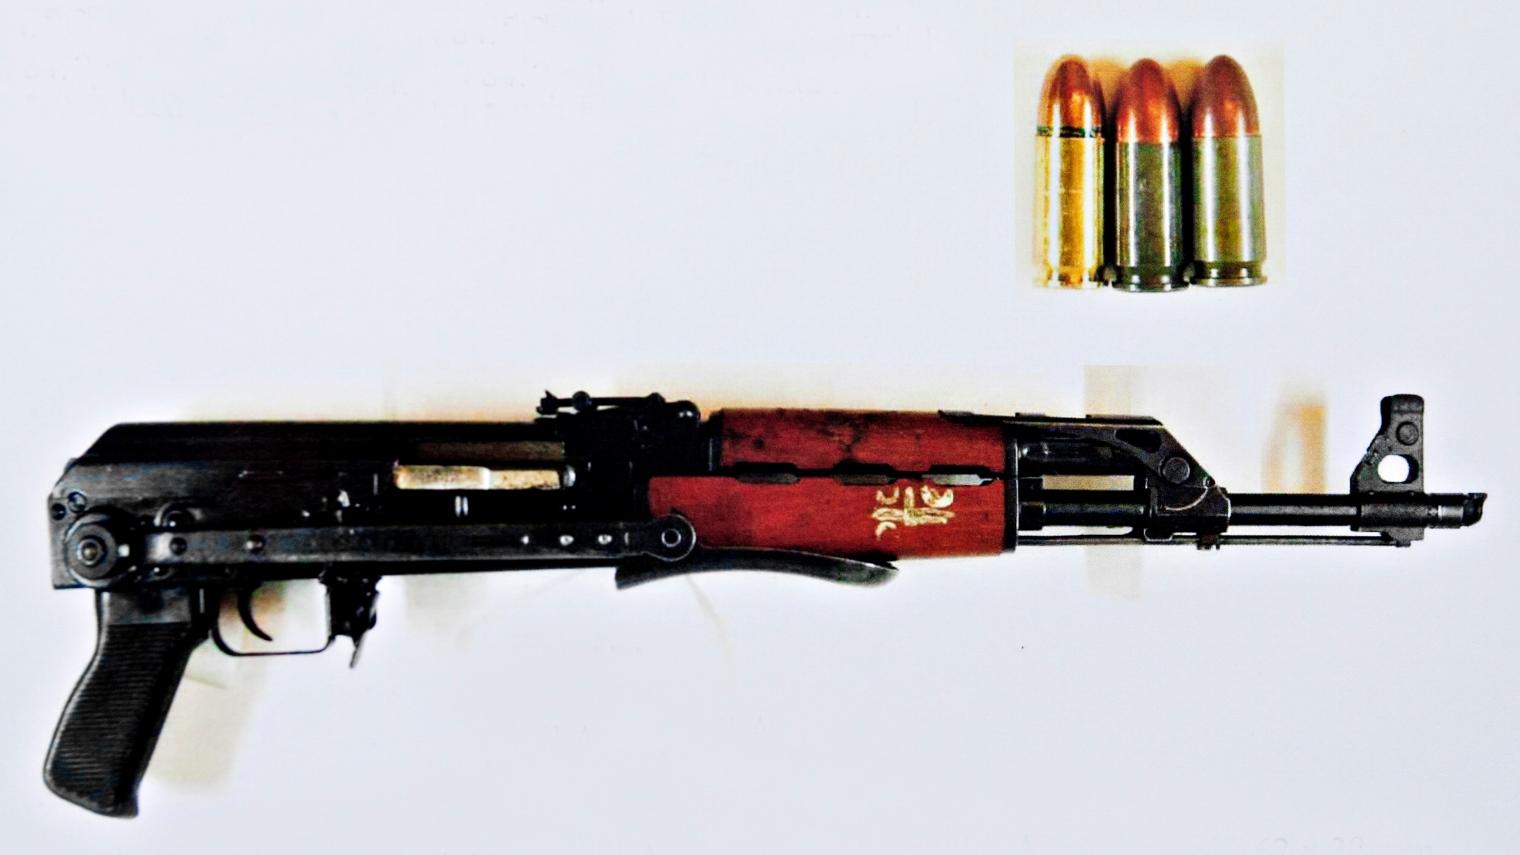 Hotades med automatvapen